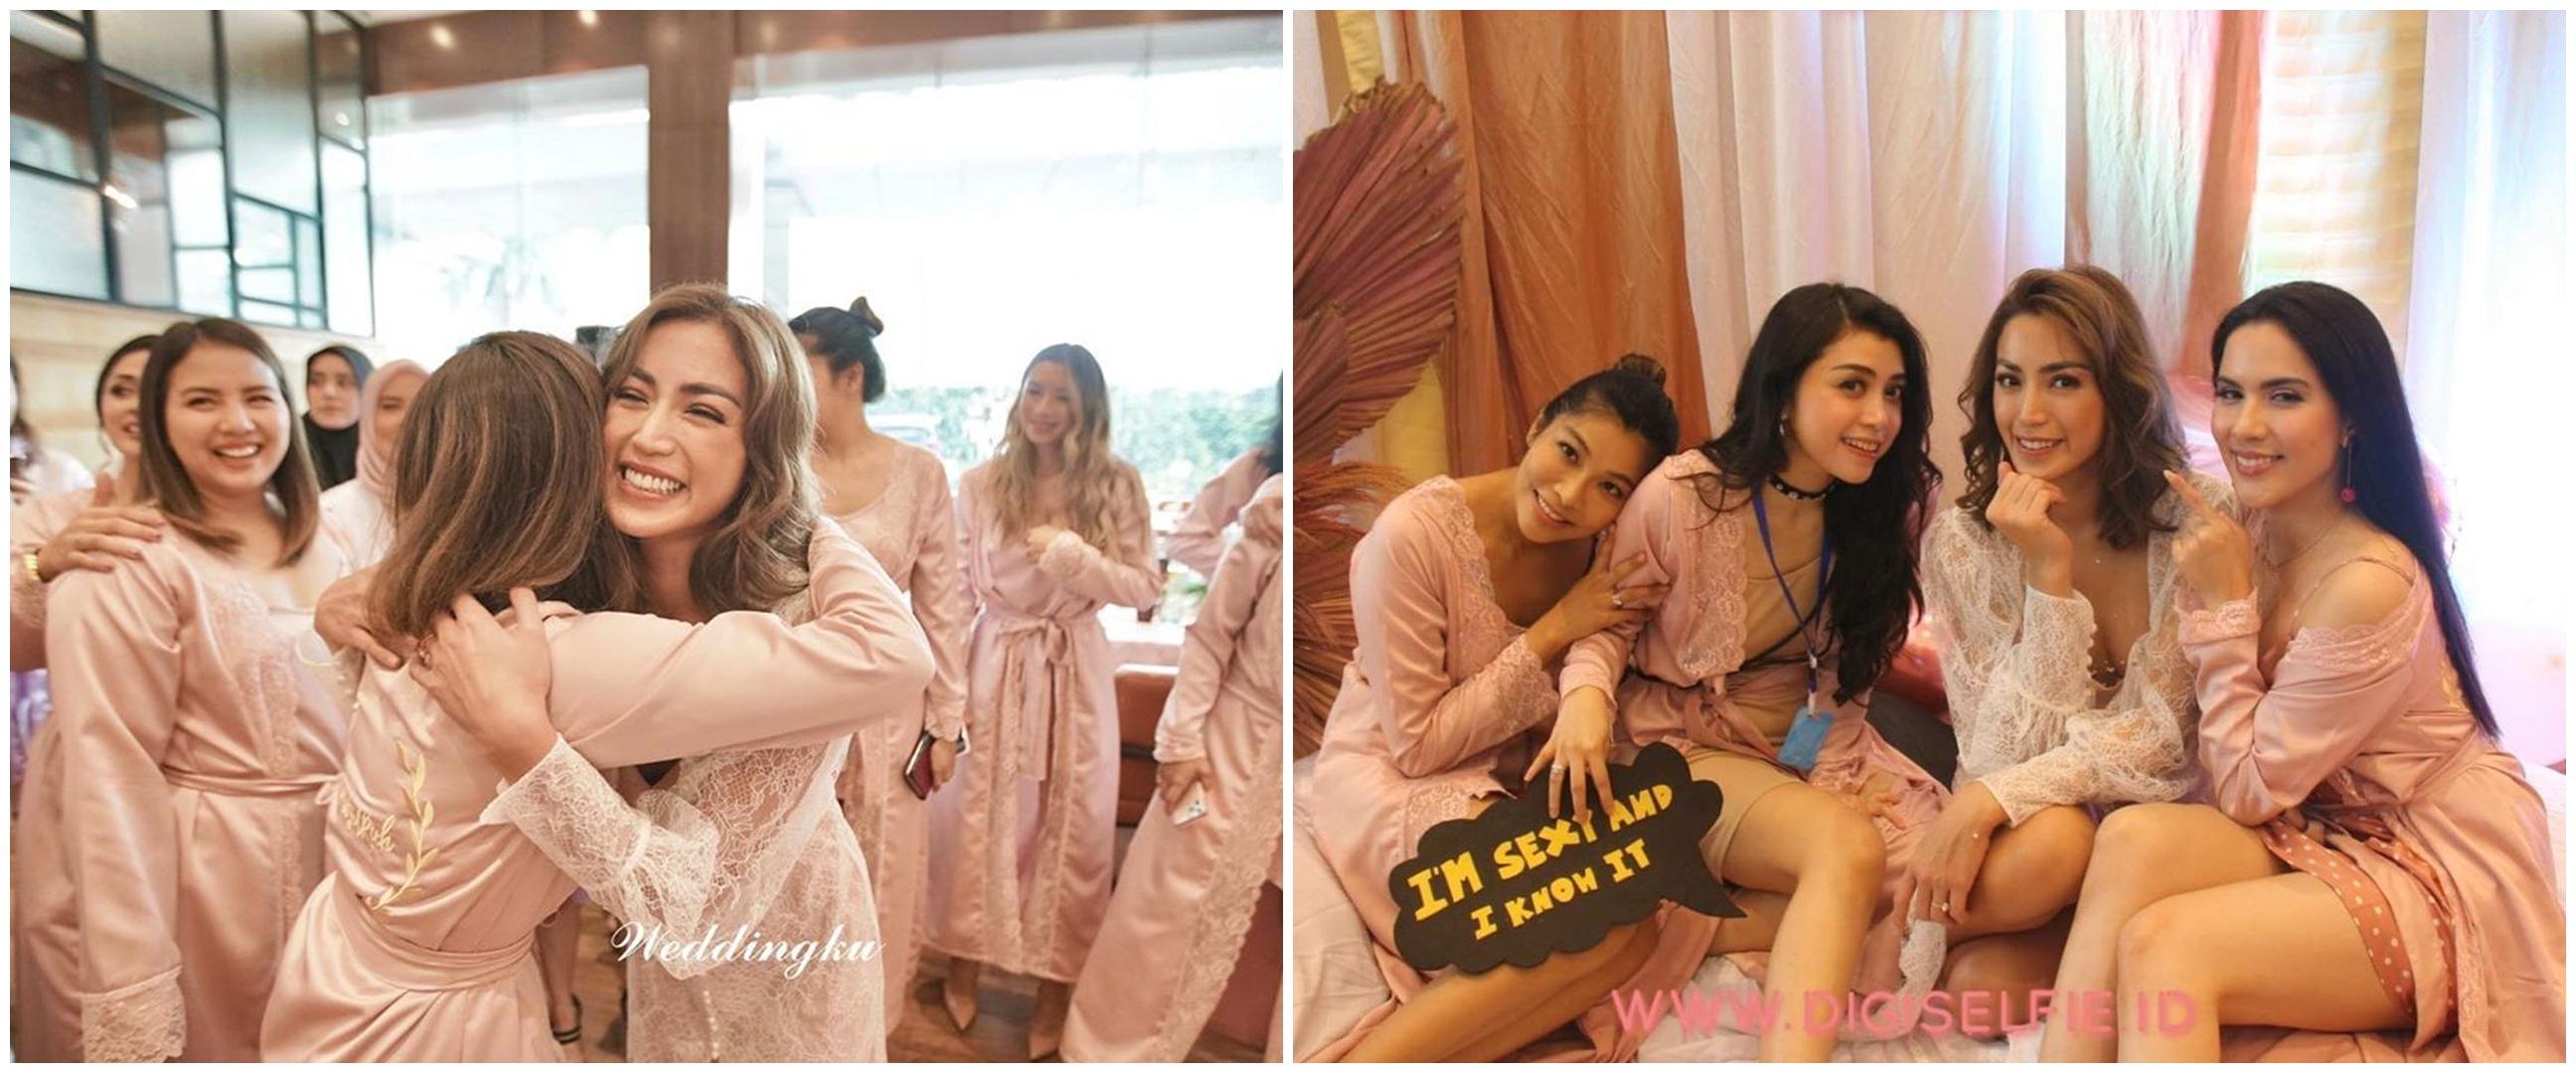 10 Potret bridal shower Jessica Iskandar bareng geng artis